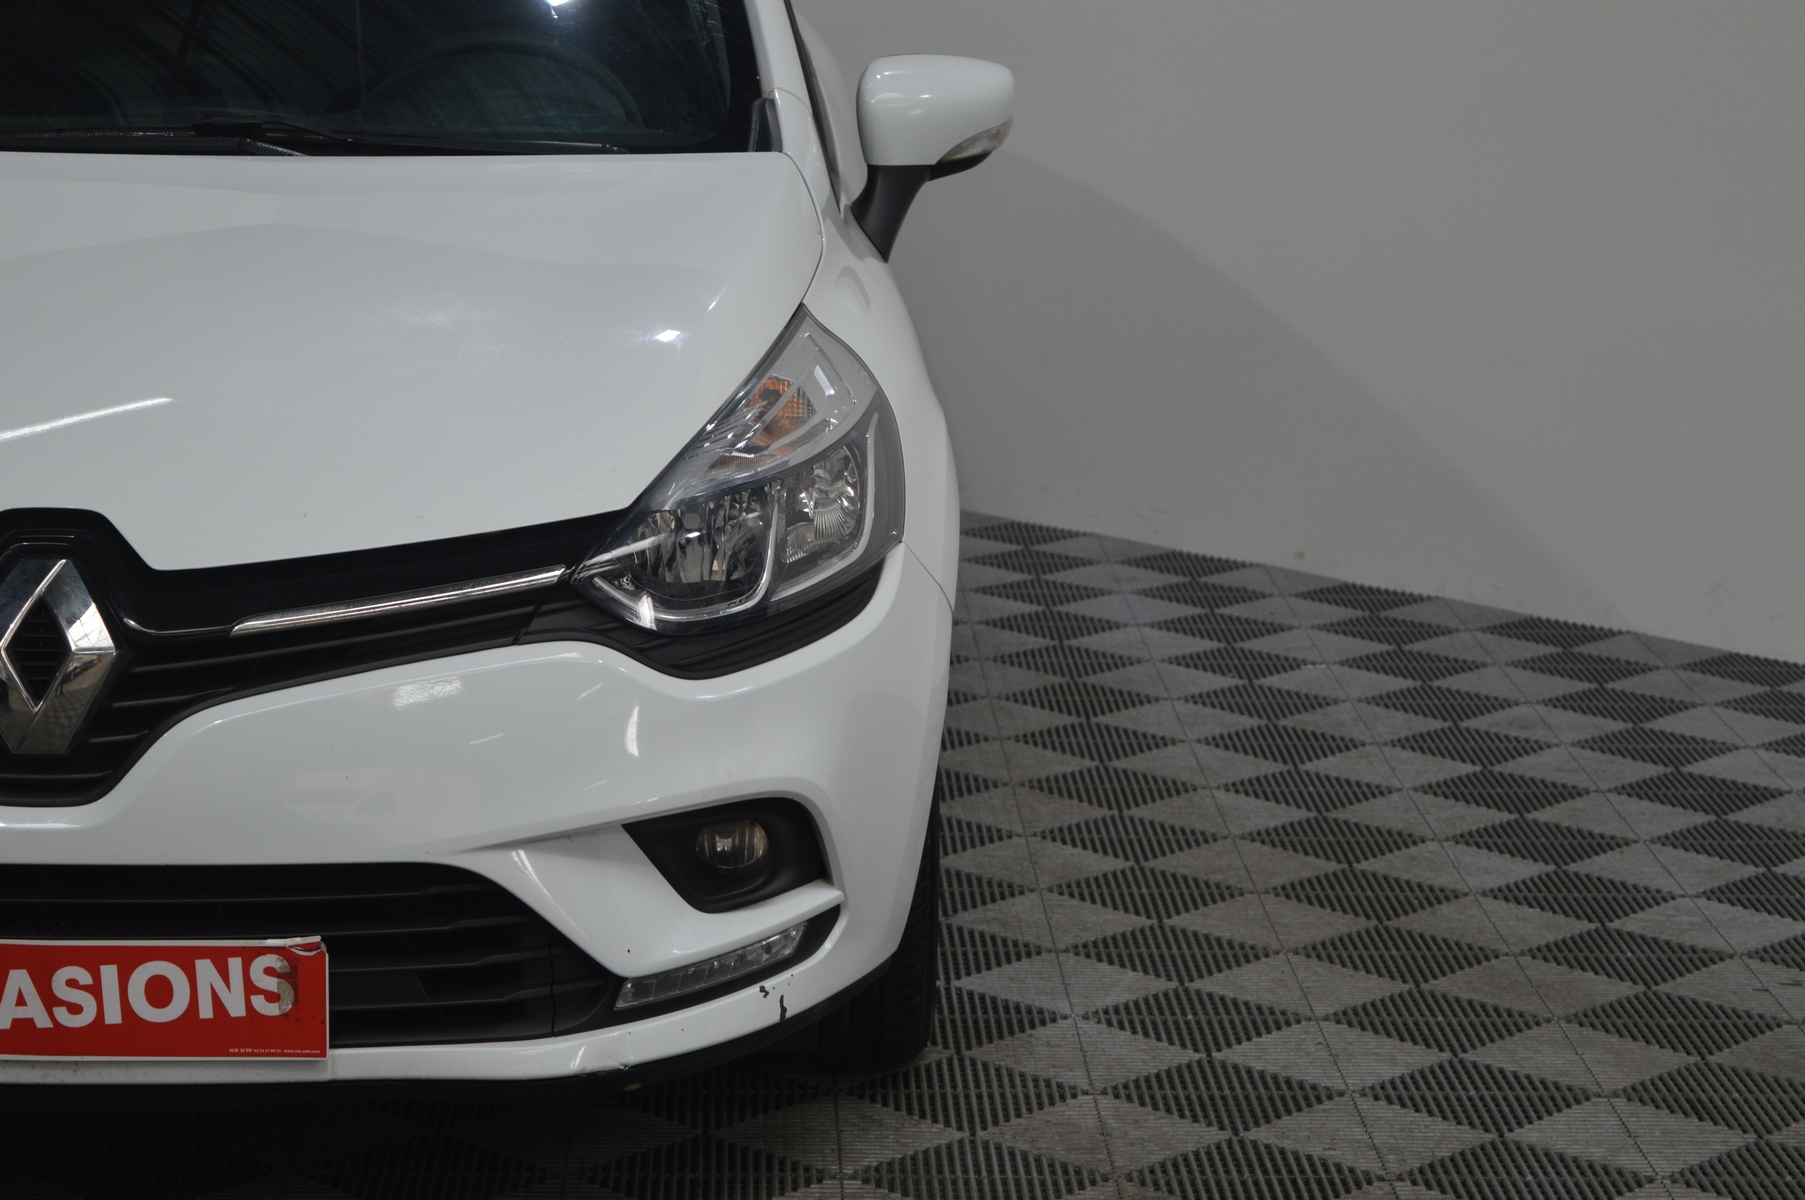 RENAULT CLIO IV SOCIETE 2018 à 7400 € - Photo n°30